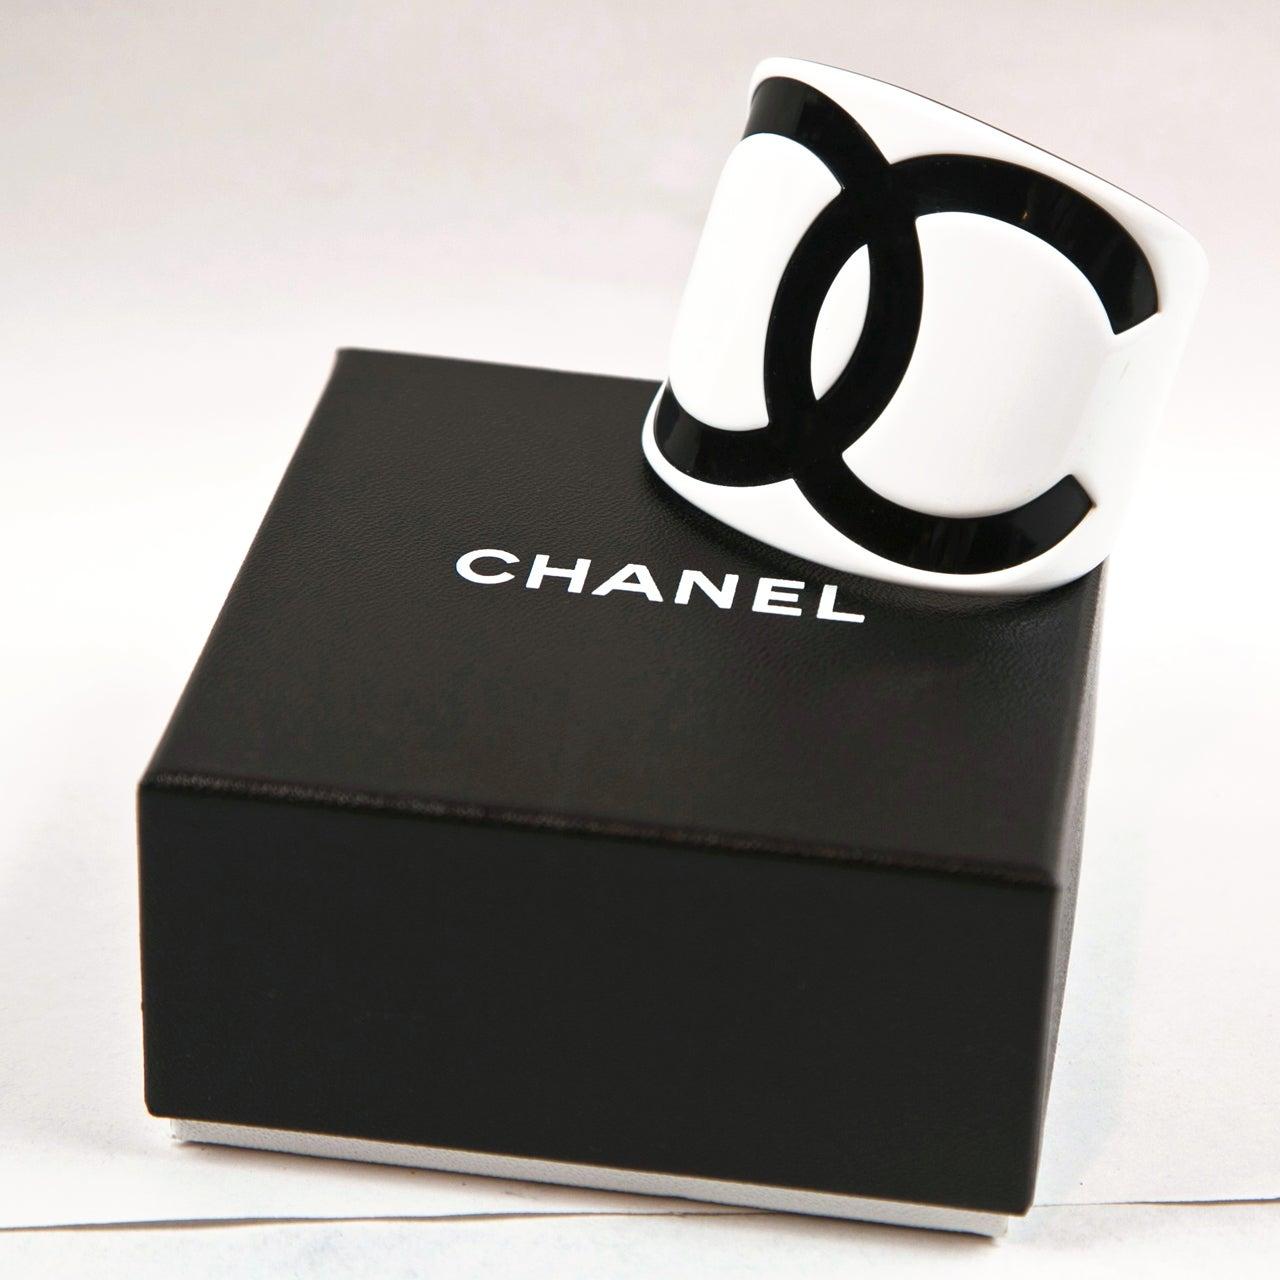 Chanel Resin Cuff image 5